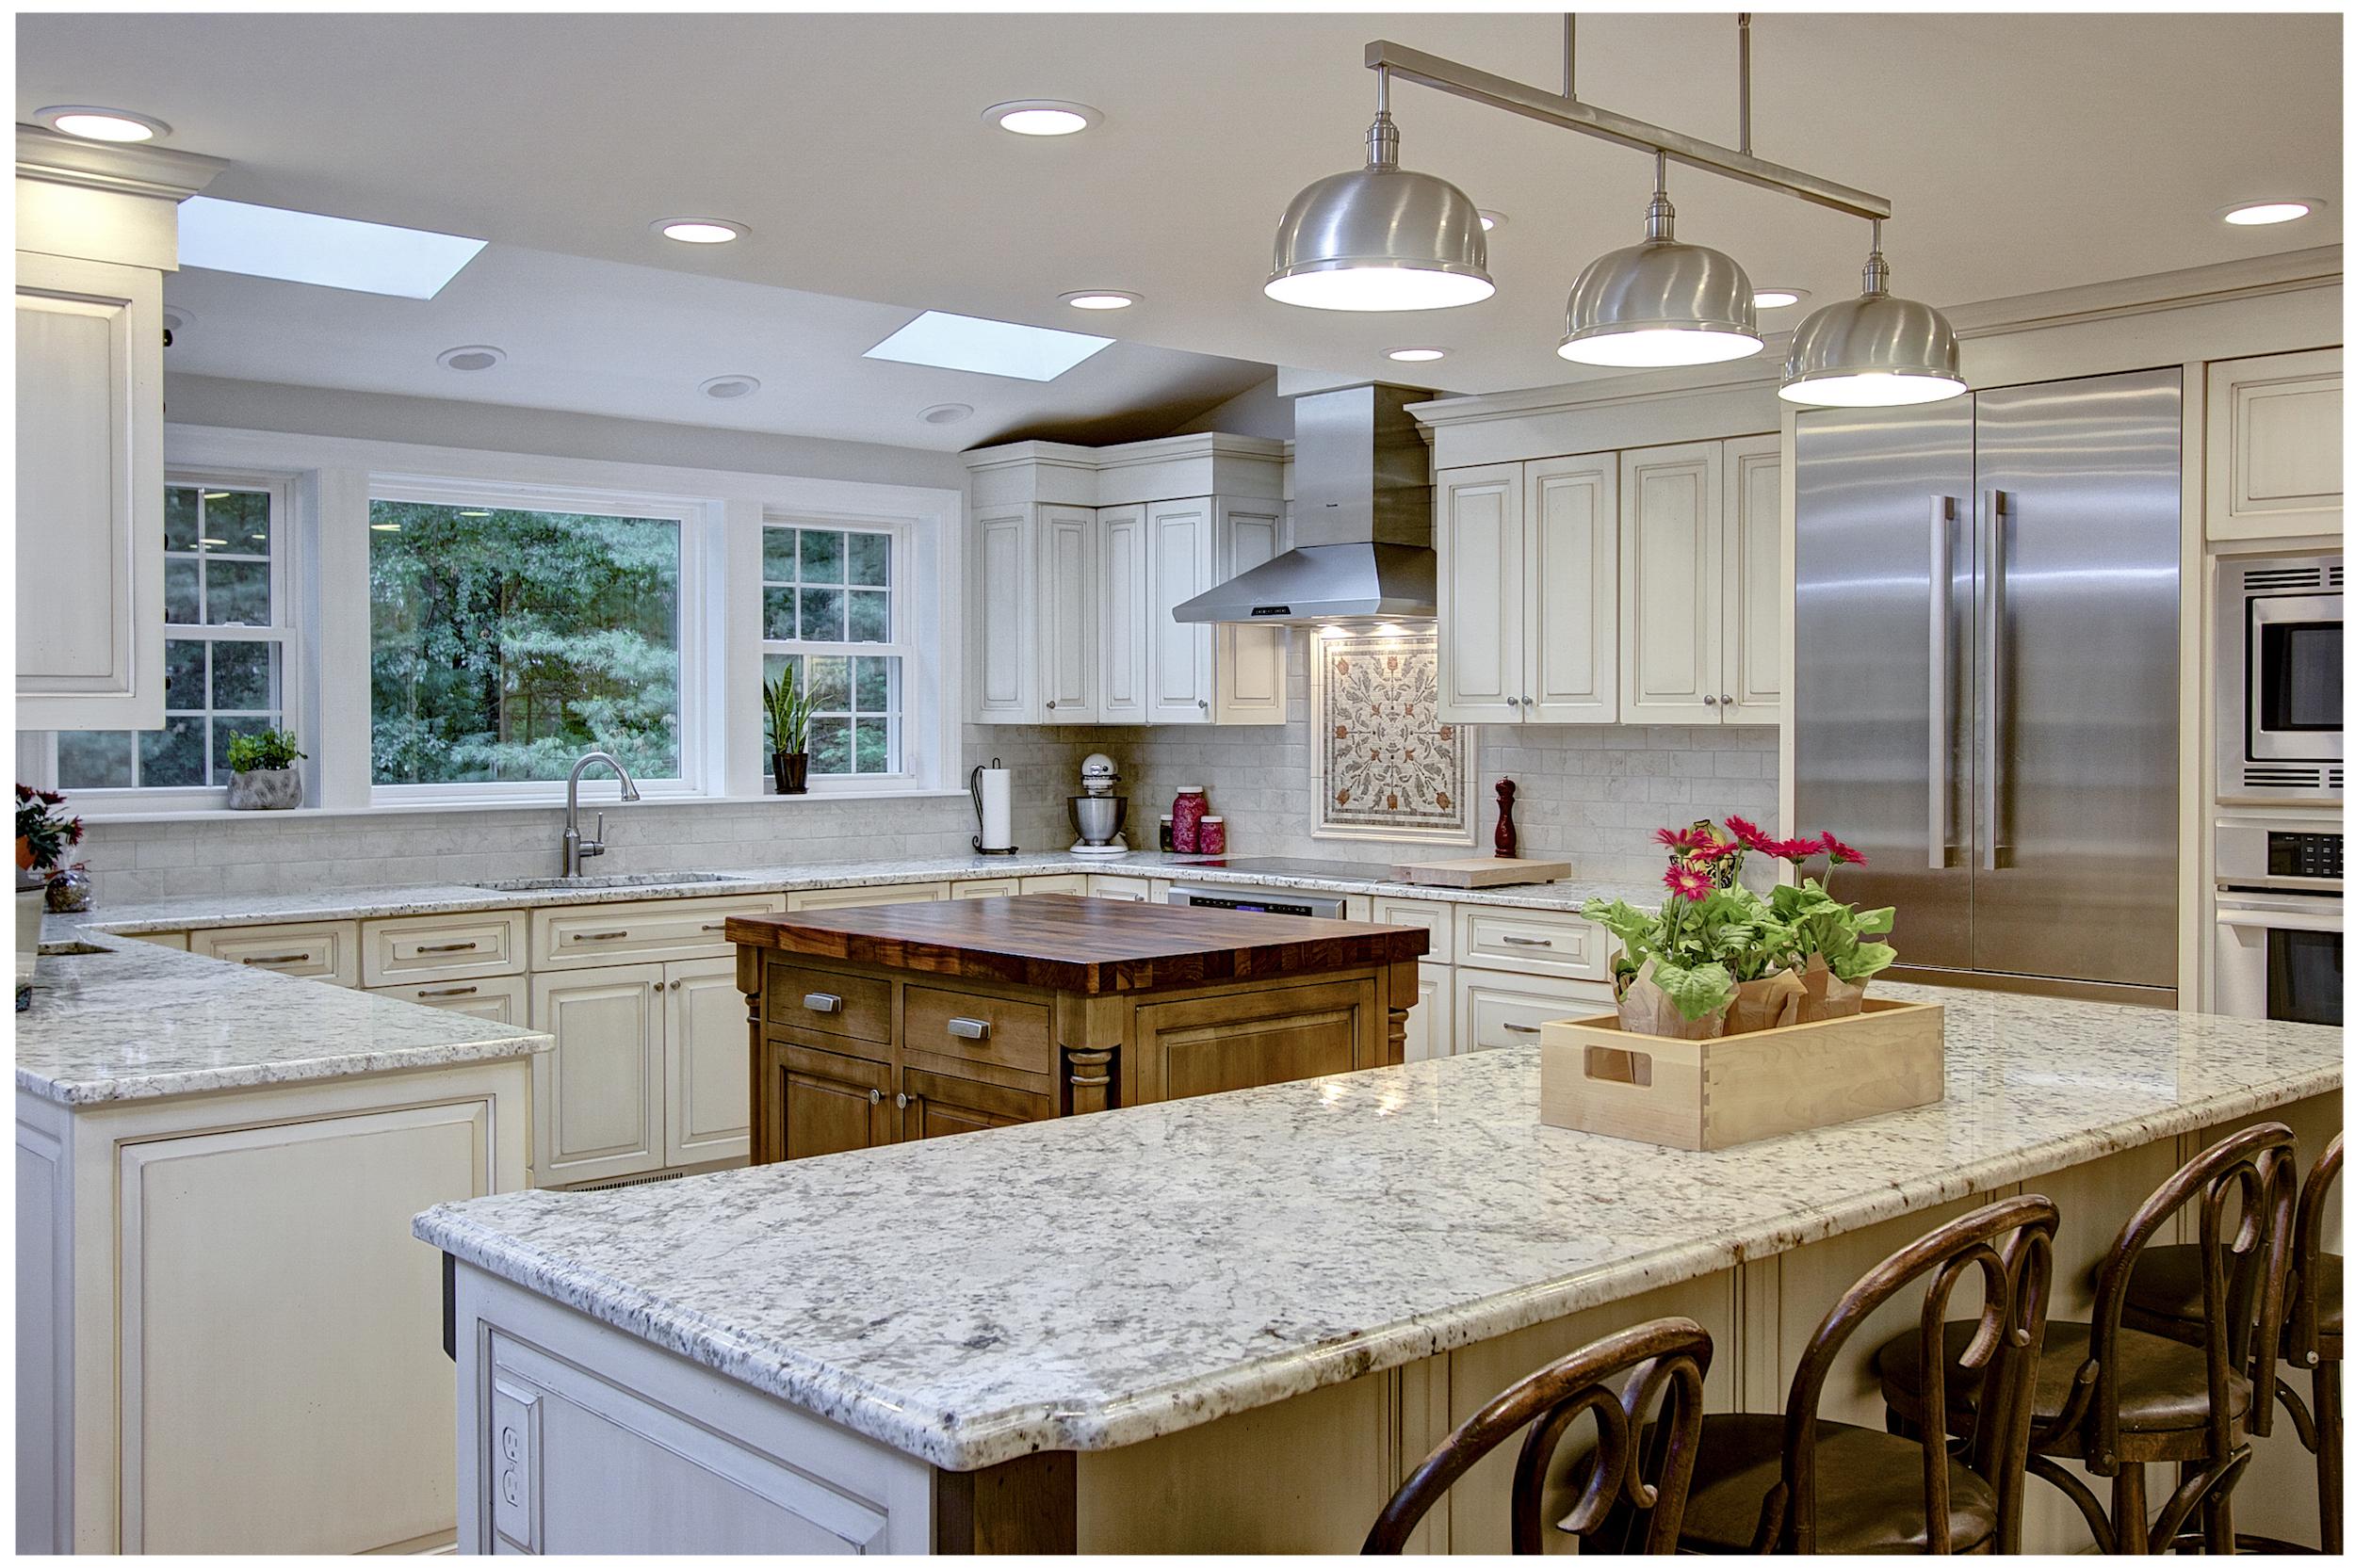 KitchenVisions-New-Traditional-Kitchen-Sudbury-1.jpg